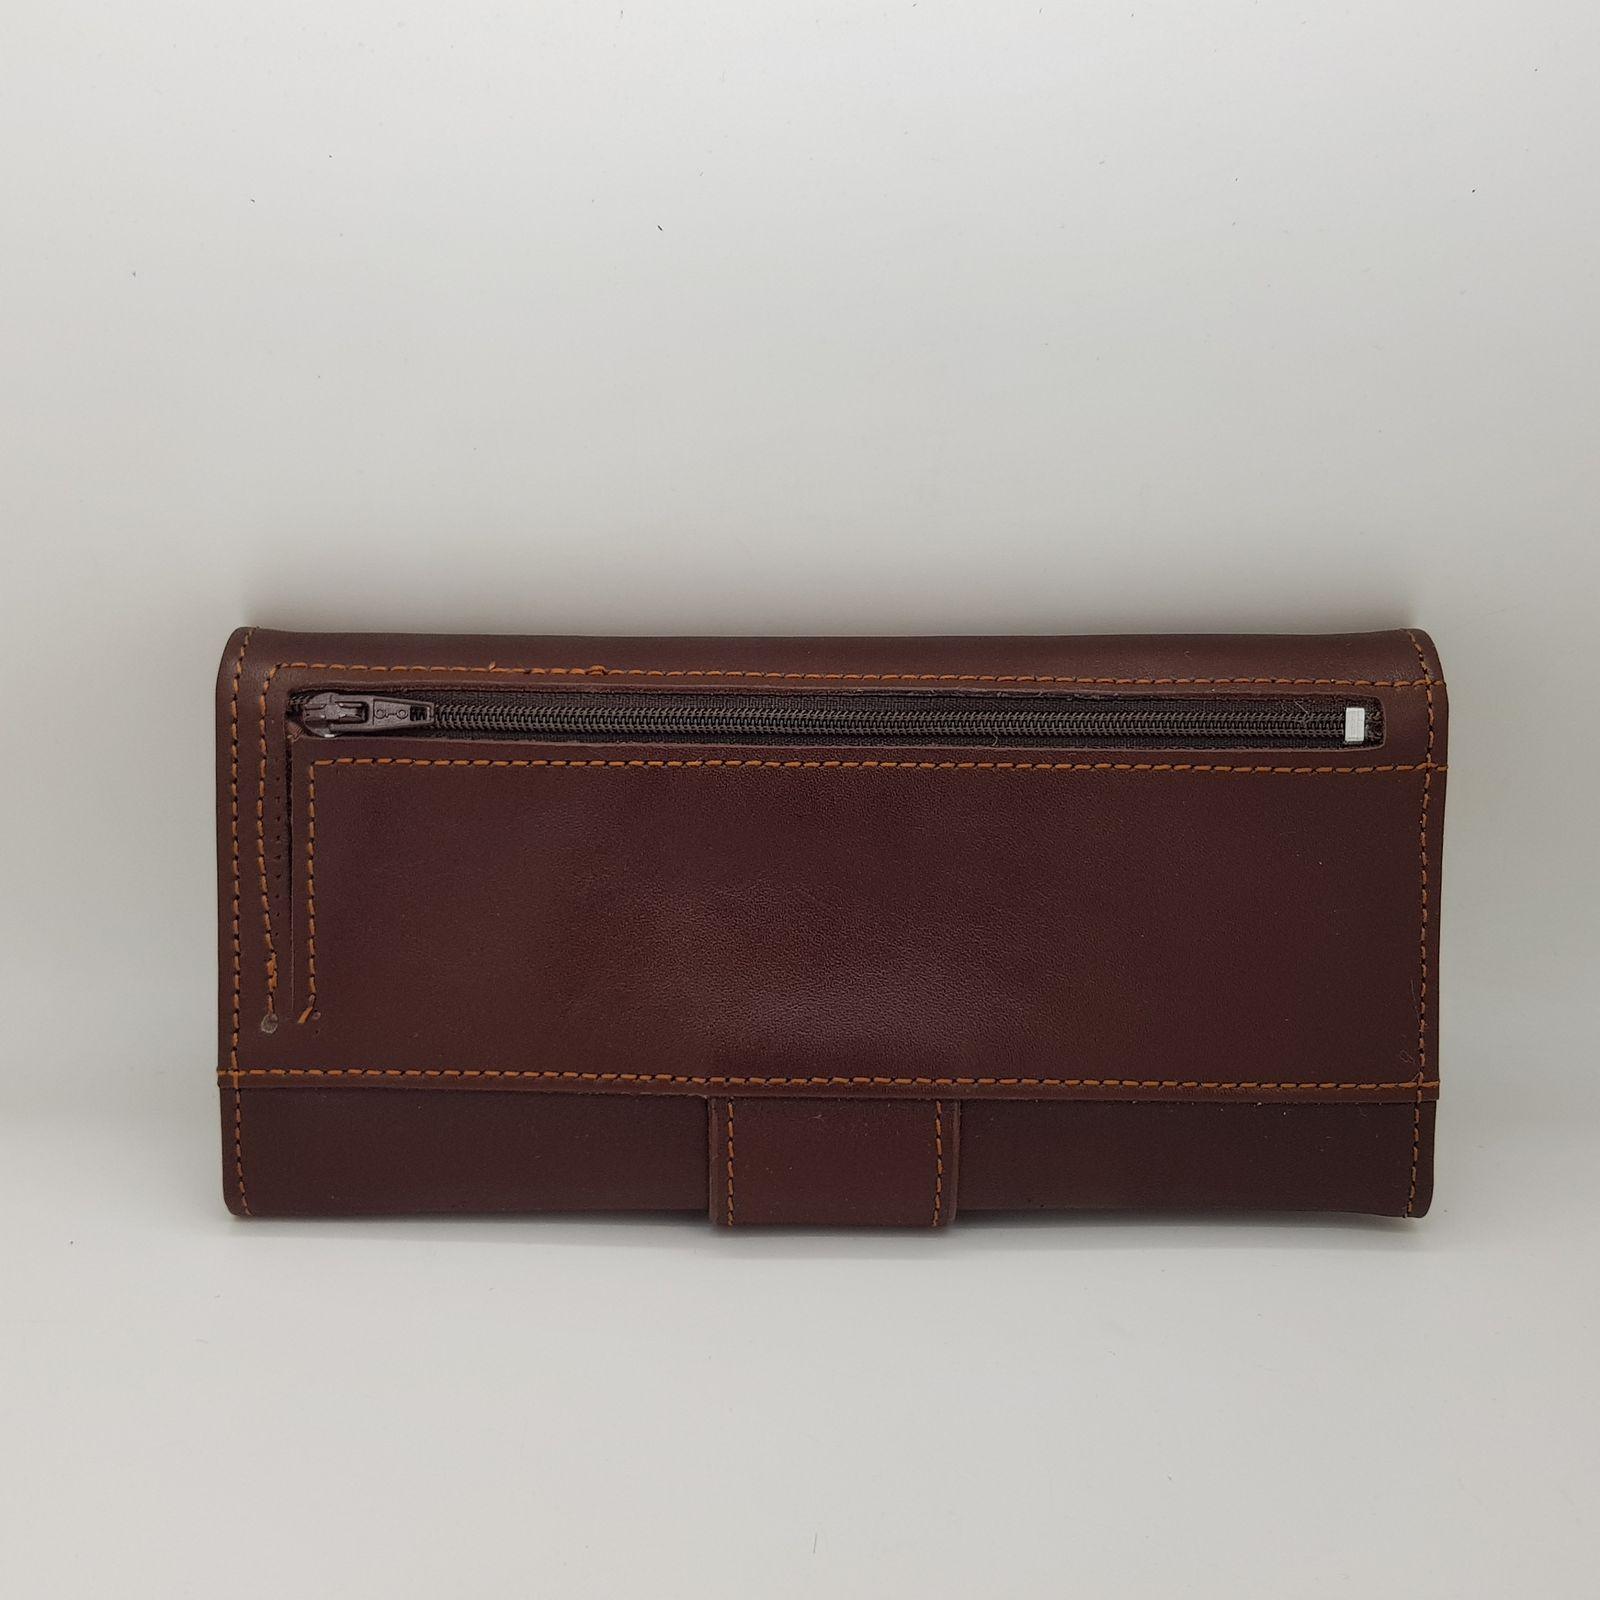 کیف پول زنانه چرم دیاکو مدل 315 -  - 19